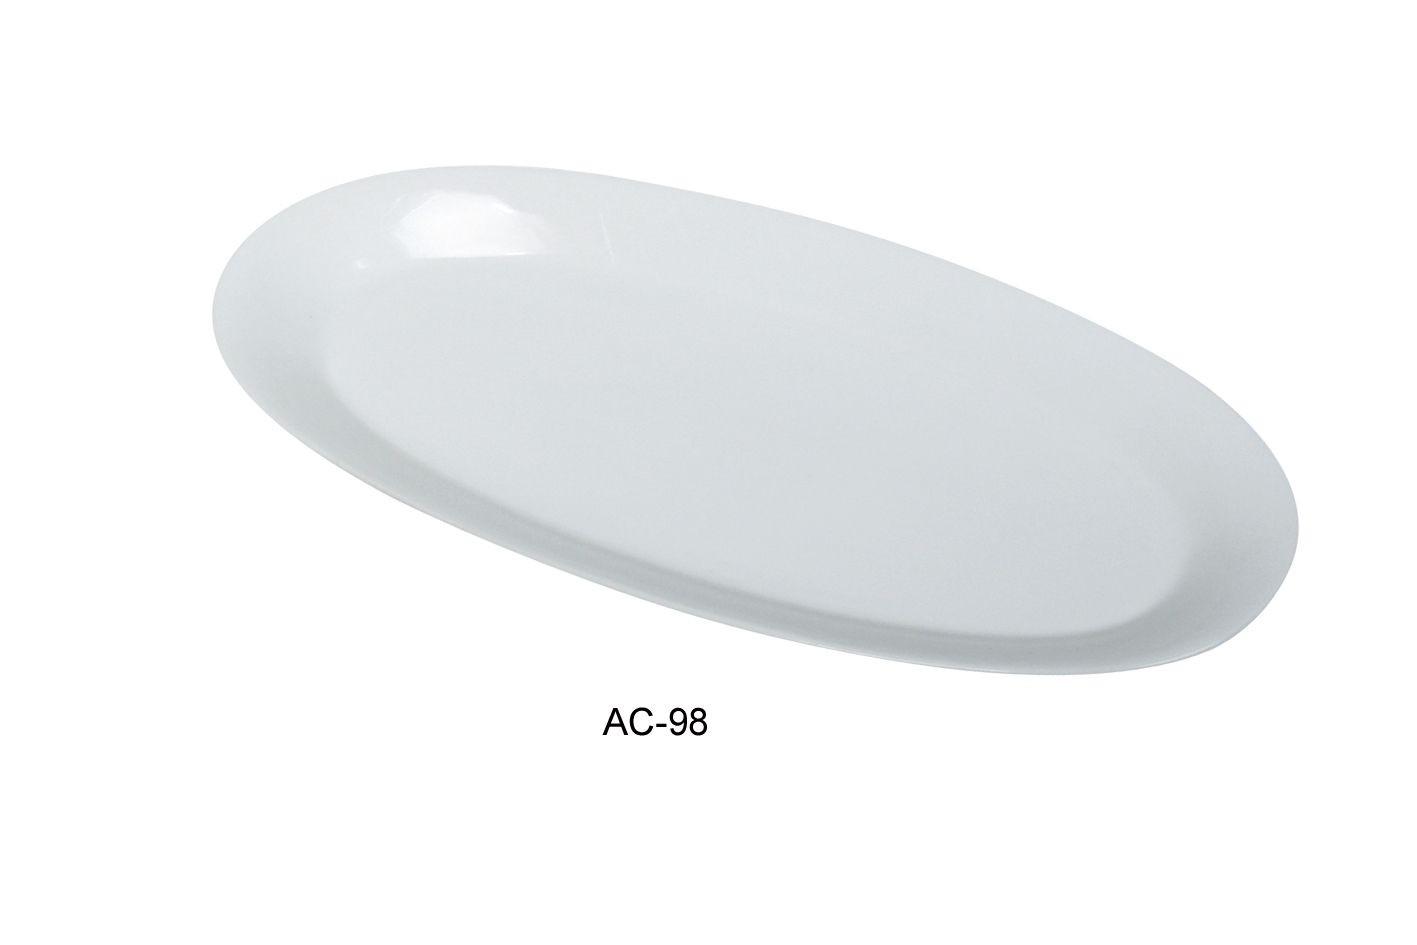 "Yanco AC-98 Abco 18"" x 8 1/4"" x 1 1/4"" Fishia Platter"